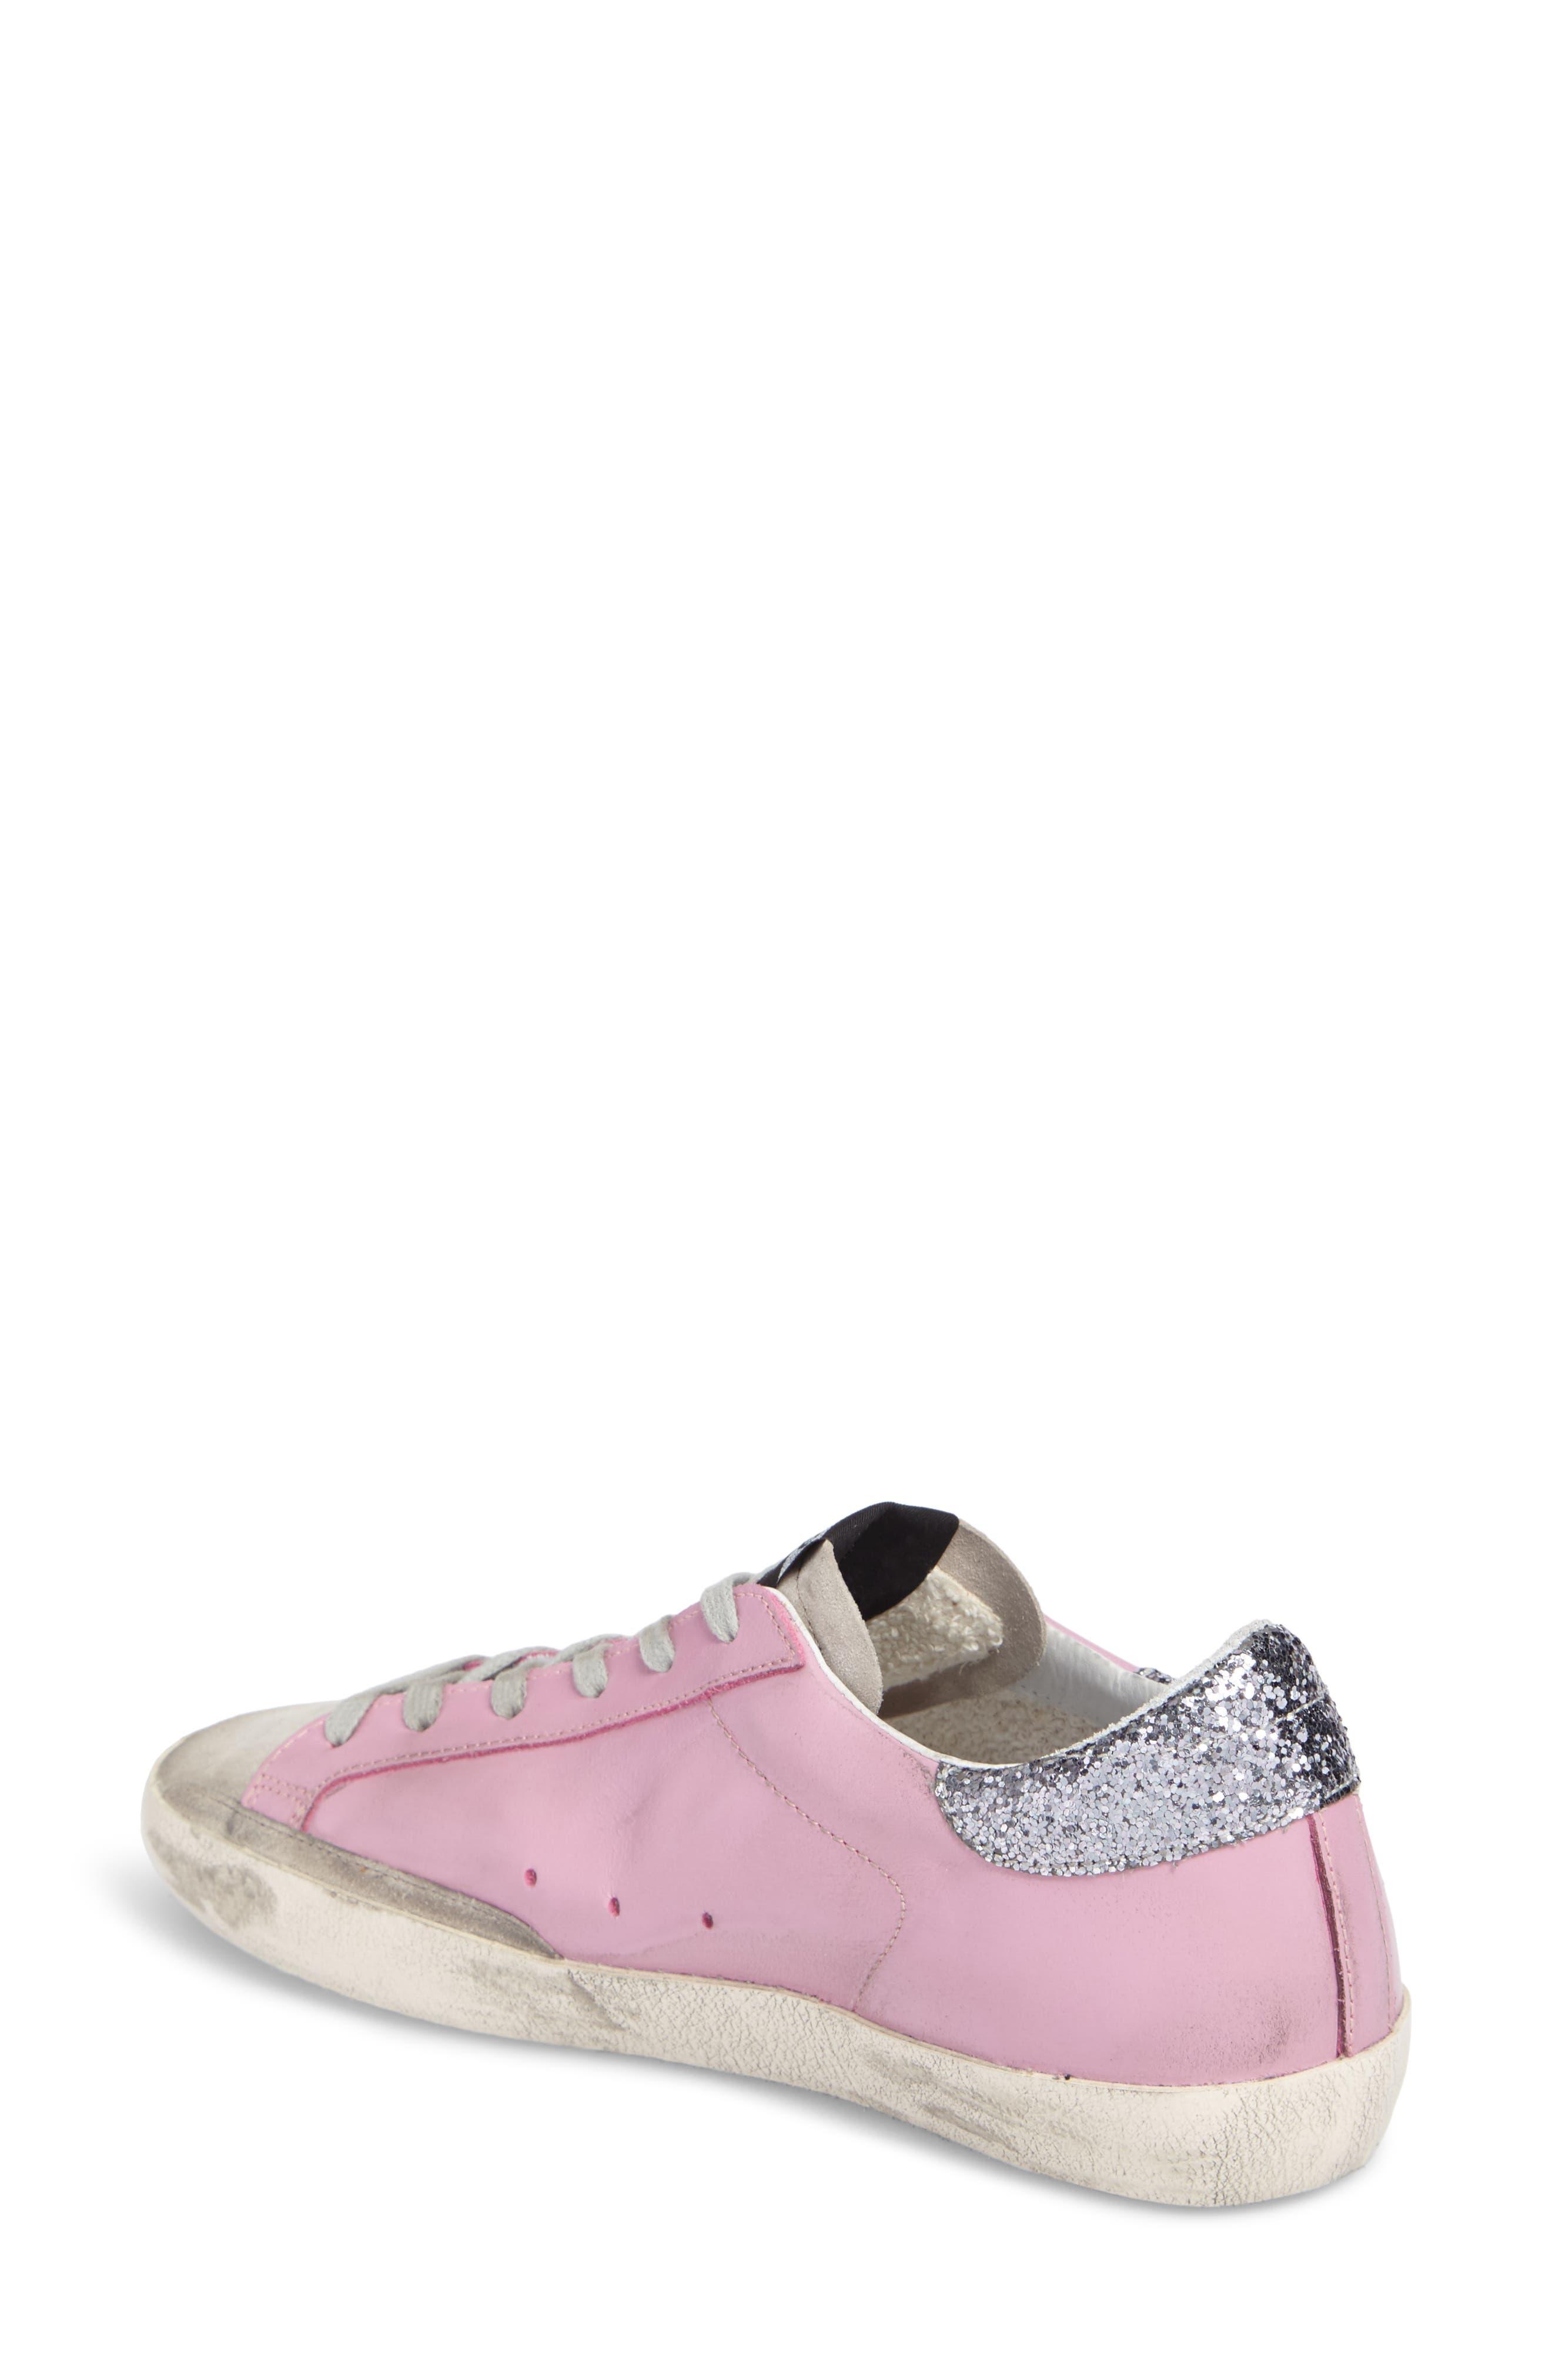 Superstar Low Top Sneaker,                             Alternate thumbnail 2, color,                             Pink/ Grey